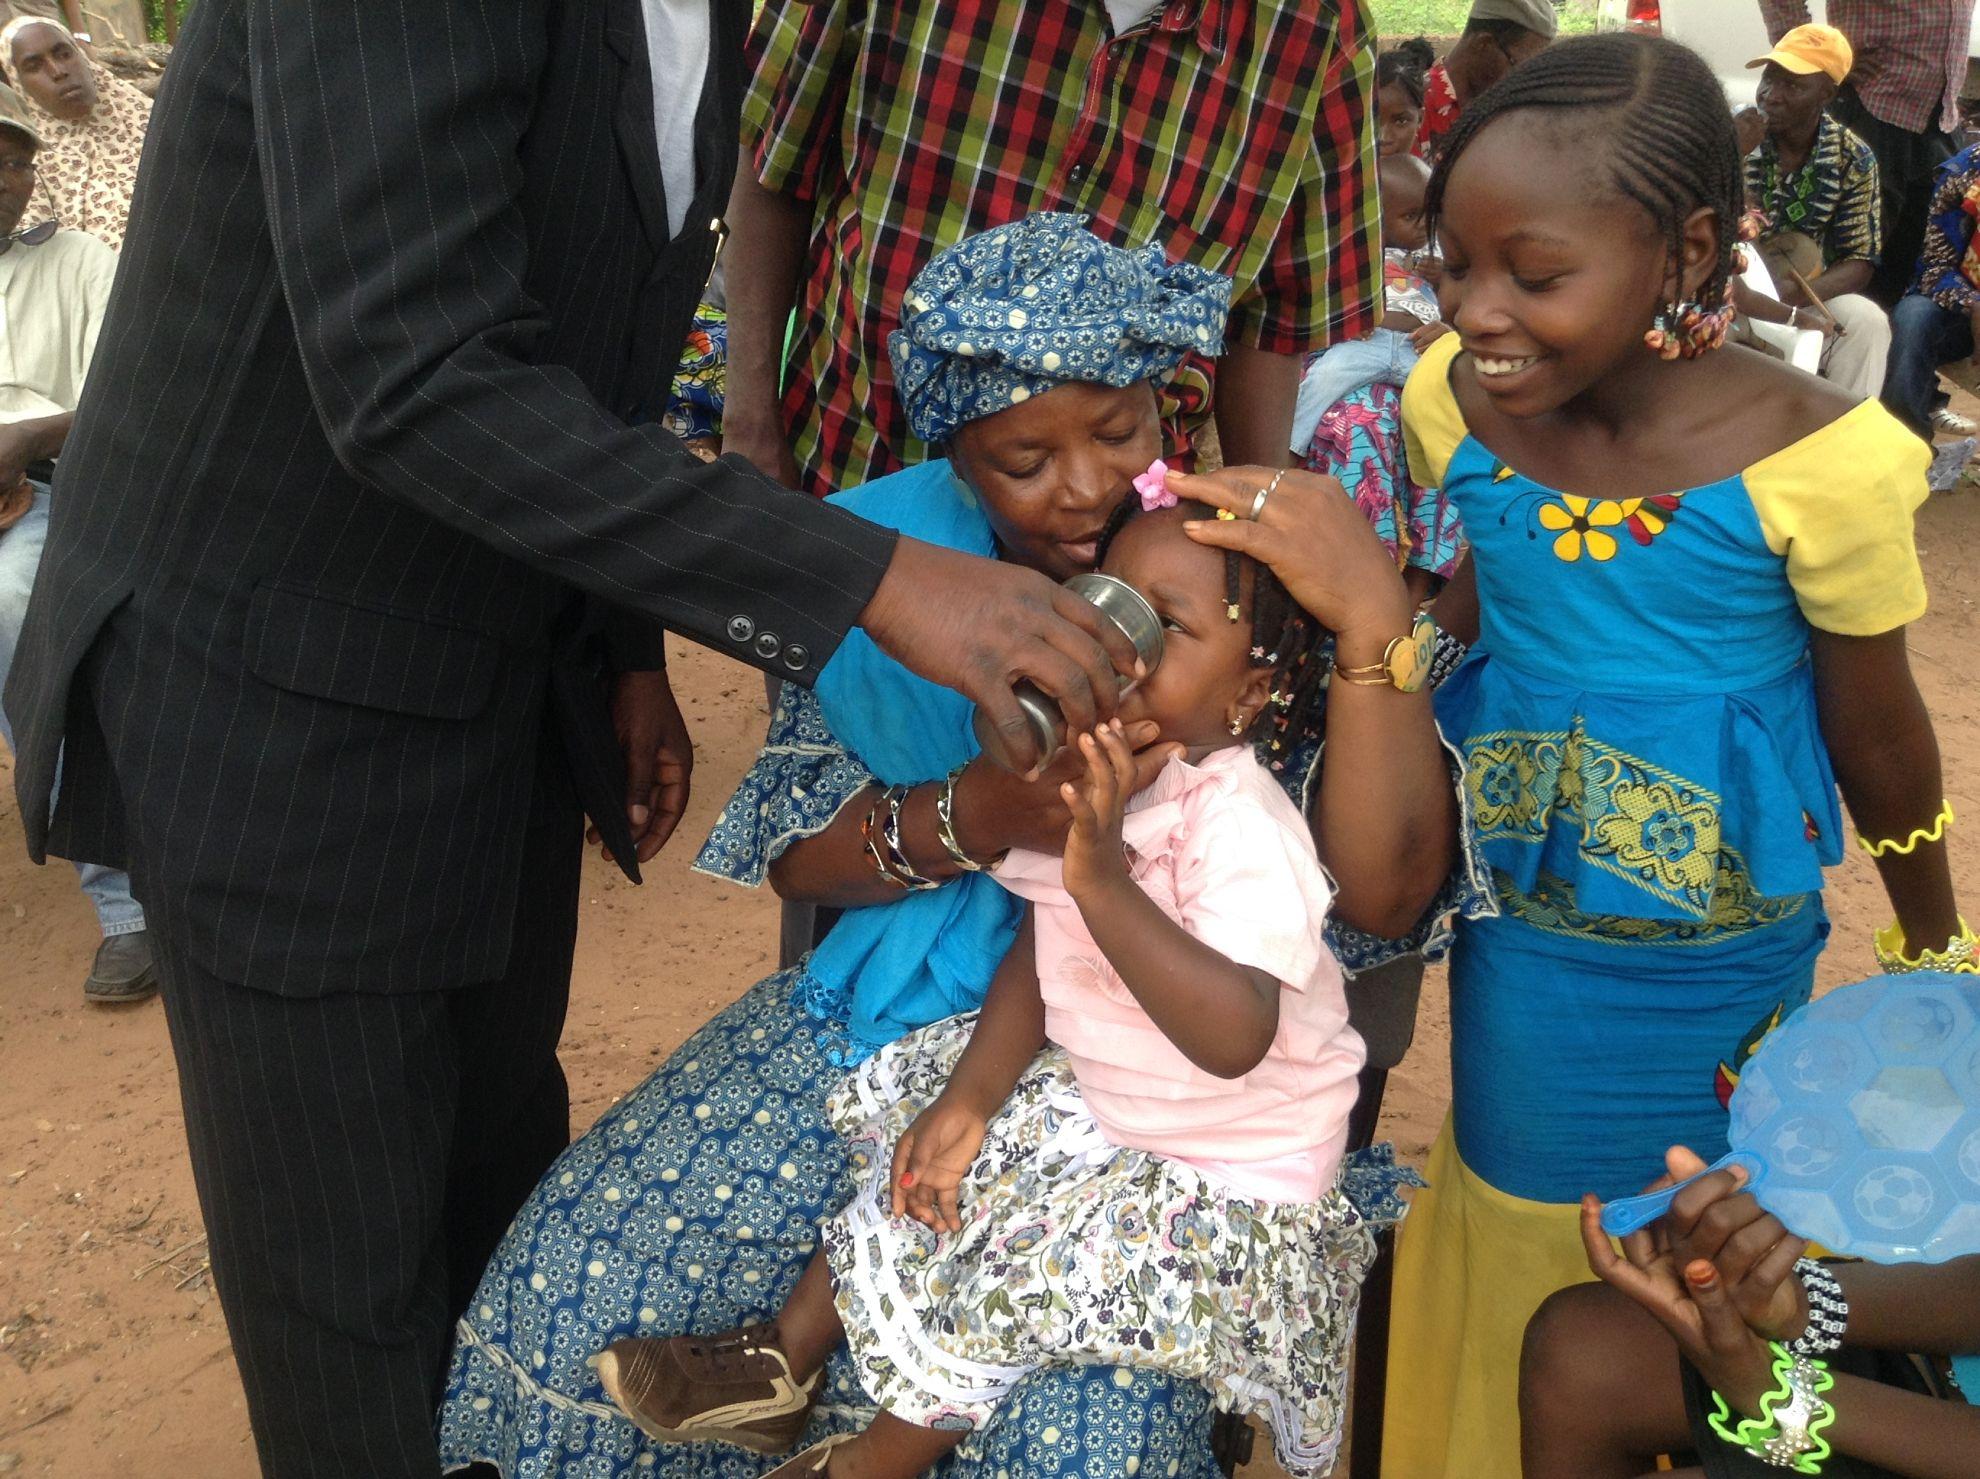 Latest News Guinea scores high despite ebola epidemic